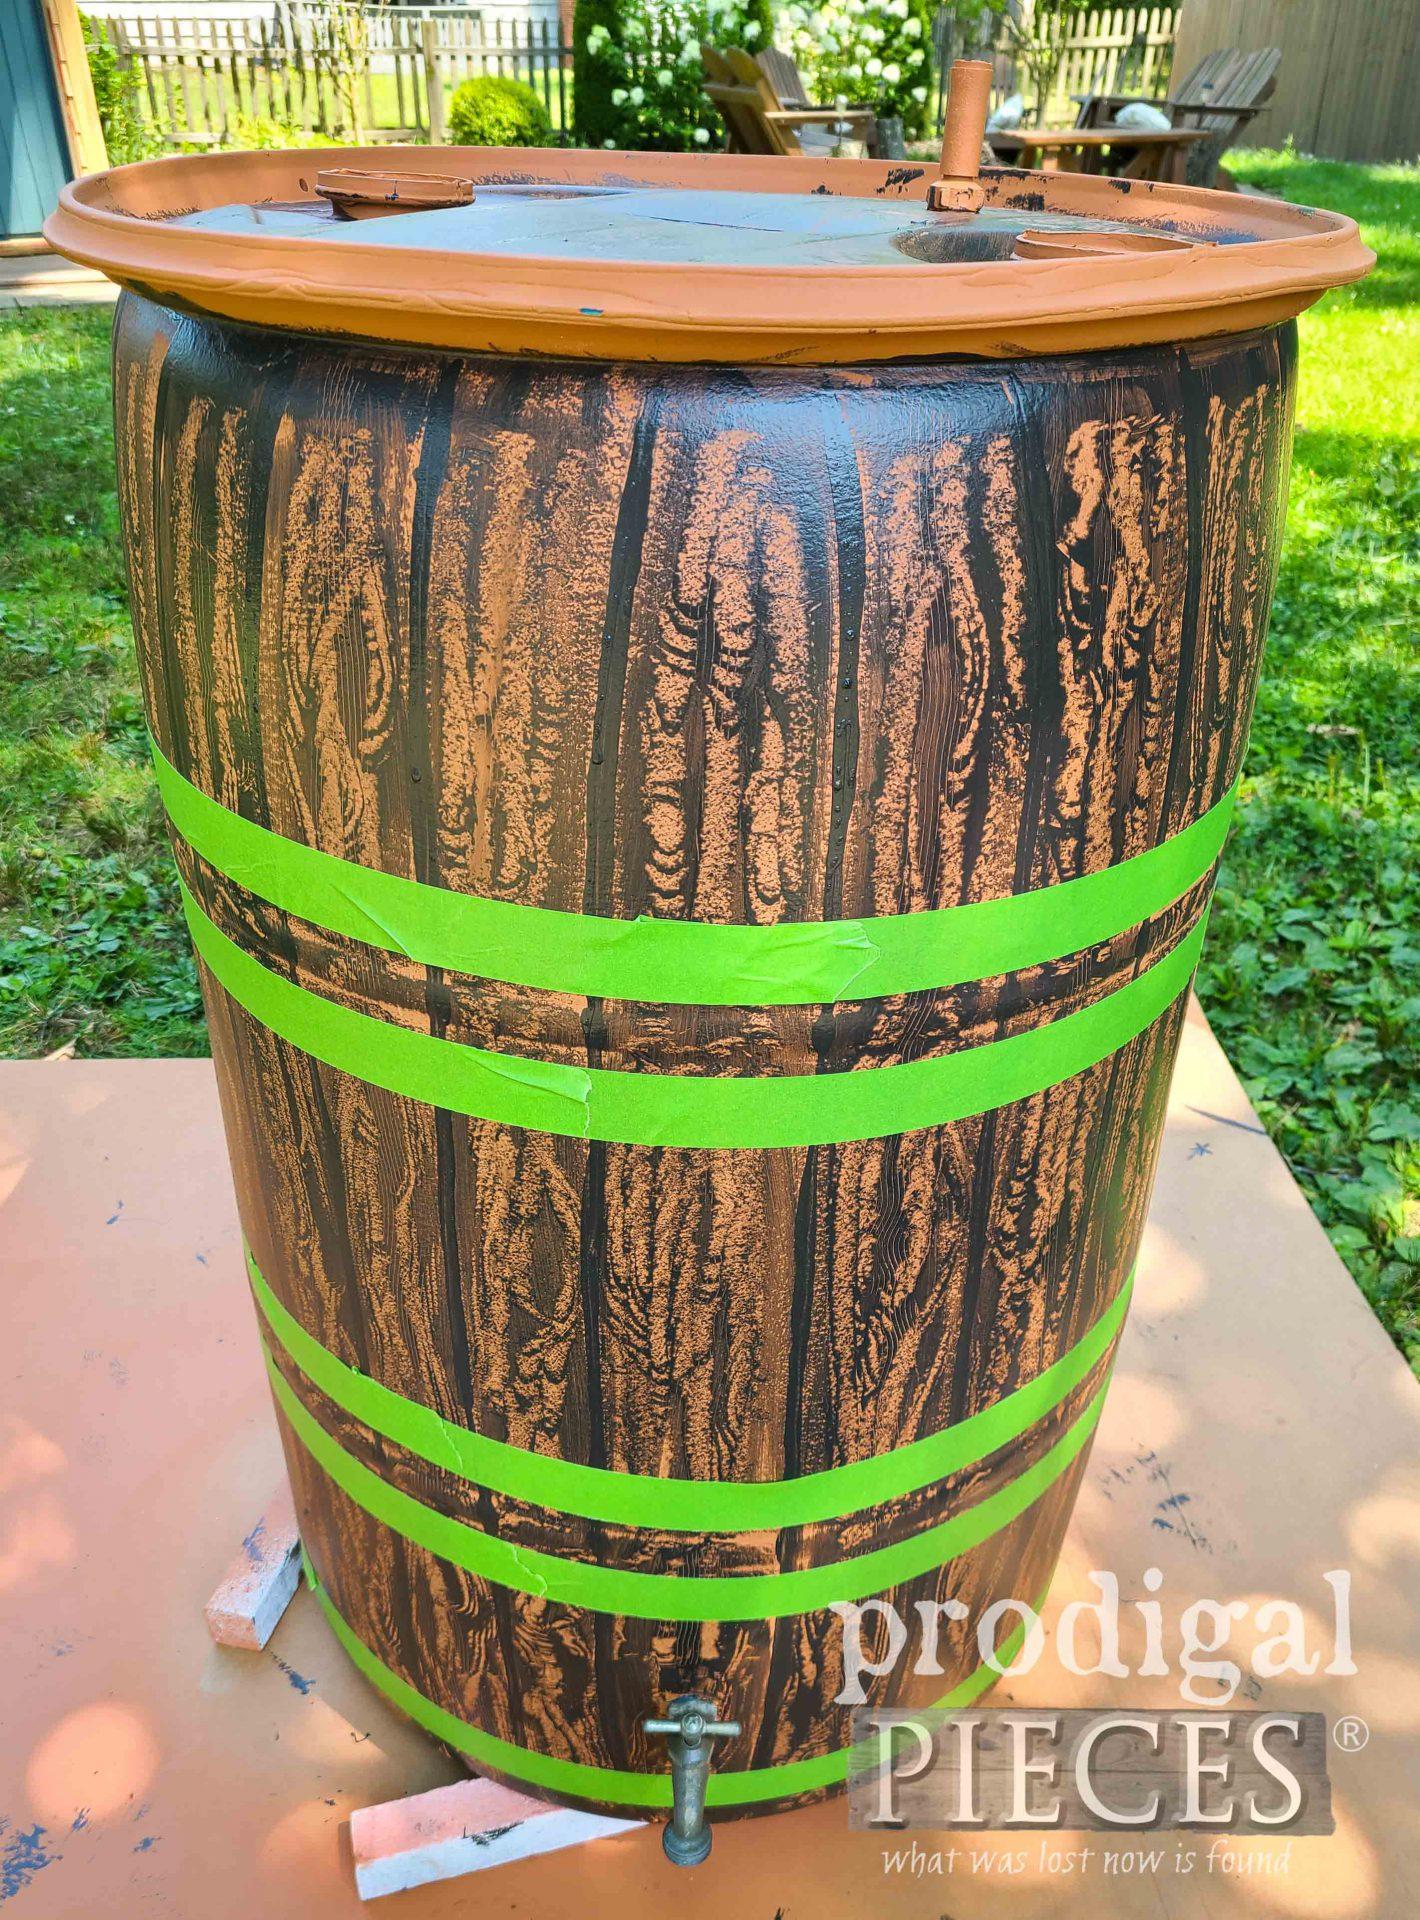 Taped Rings on DIY Rain Barrel | prodigalpieces.com